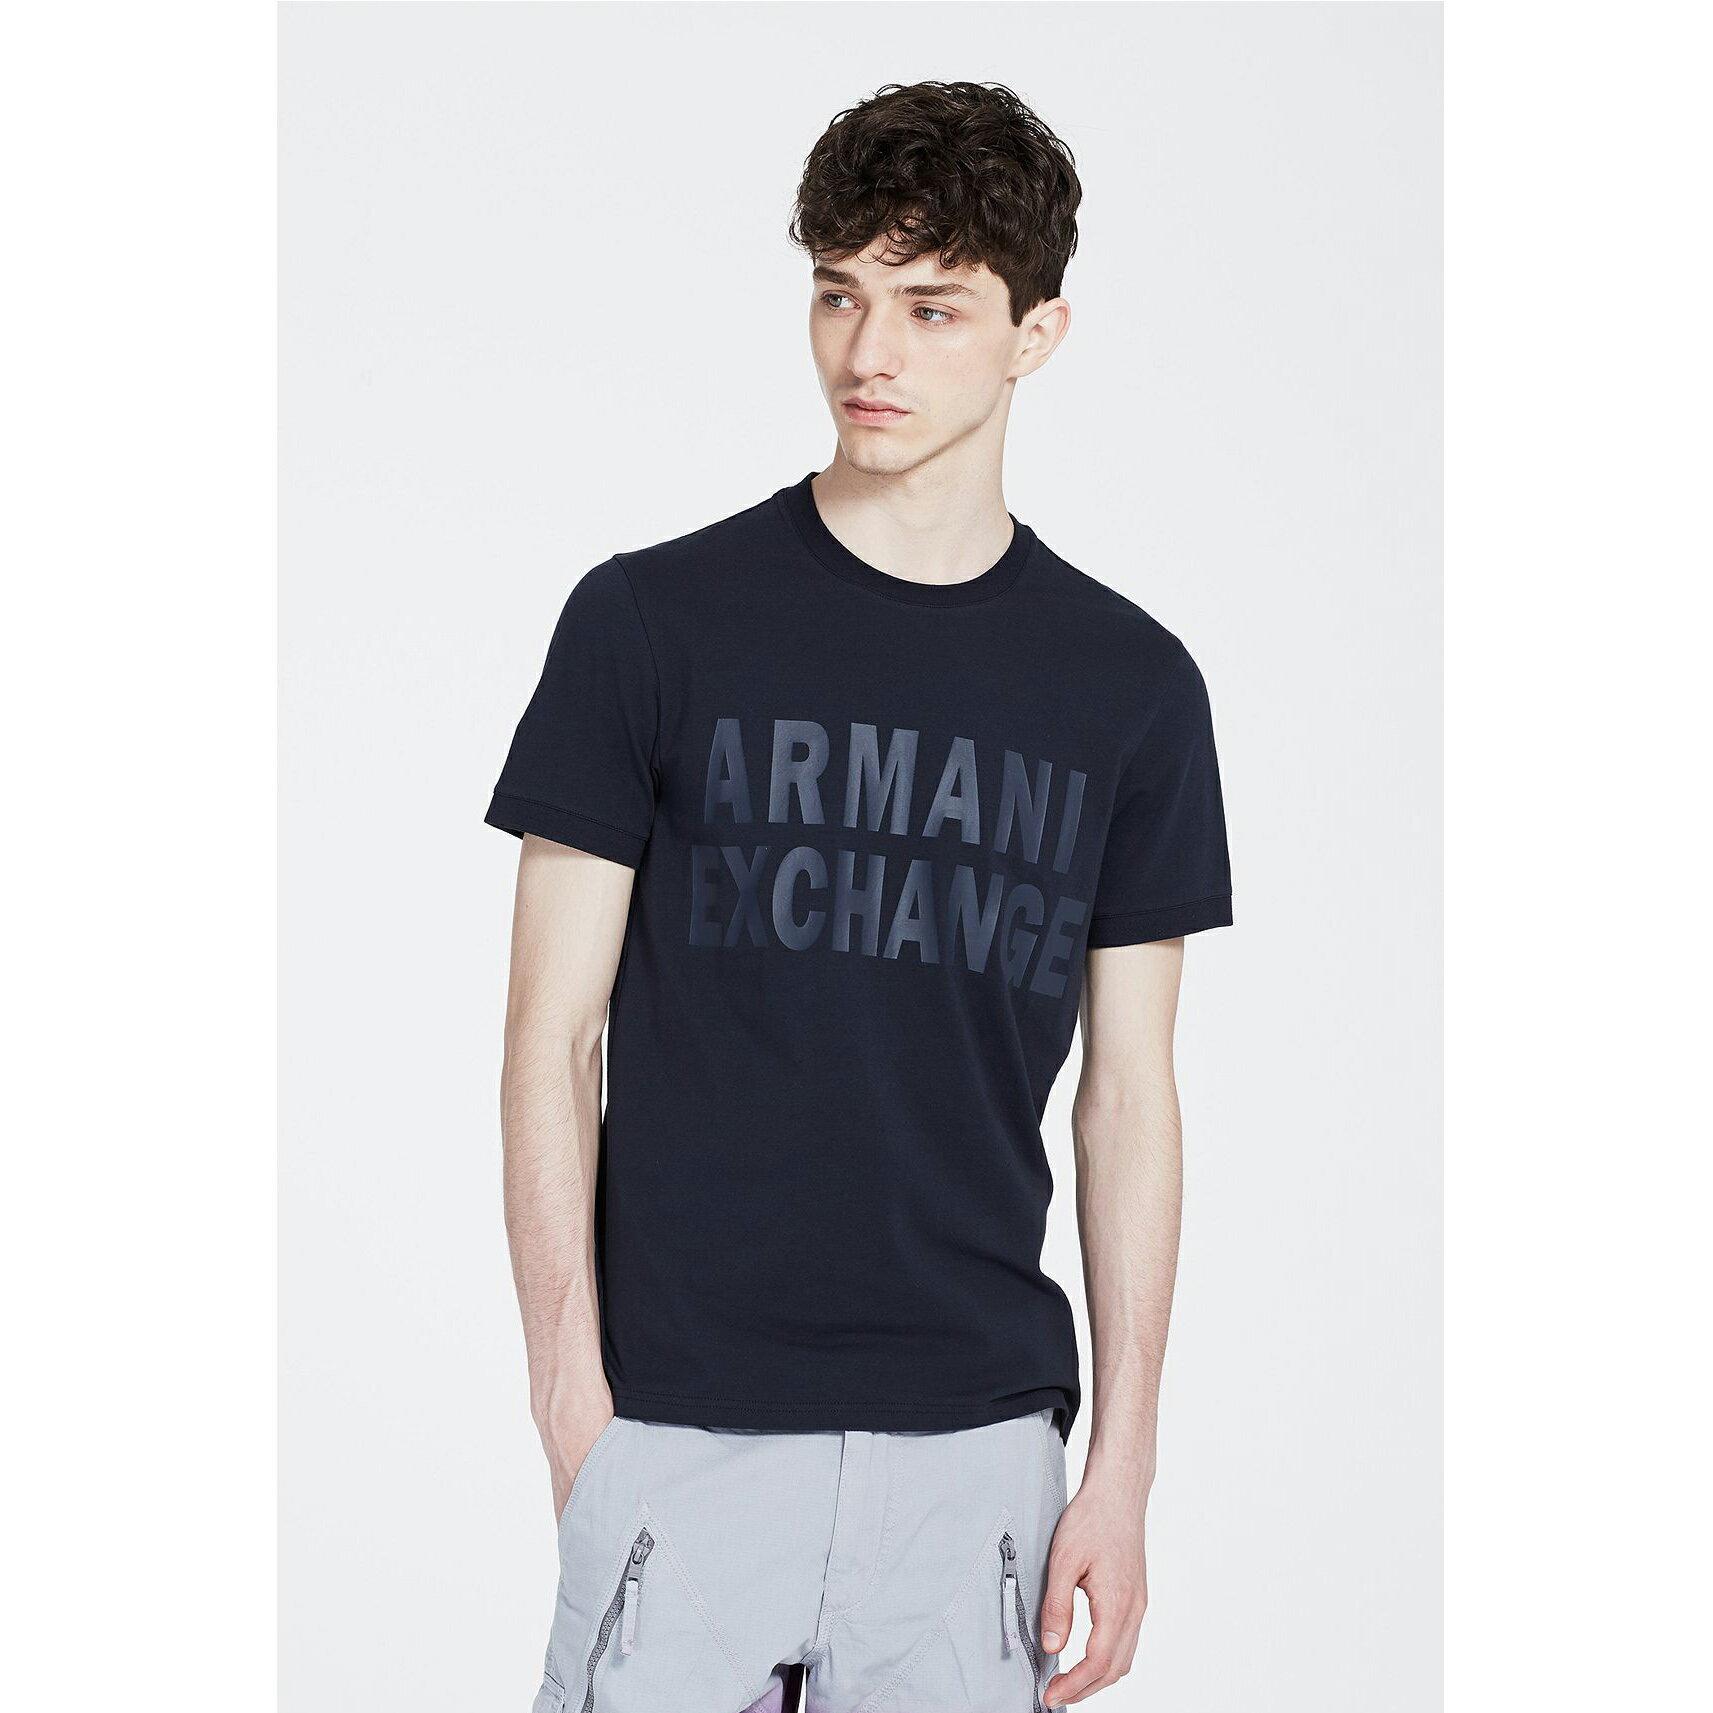 美國百分百【Armani Exchange】T恤 AX 短袖 logo 束口 T-shirt 深藍色 XS號 G060